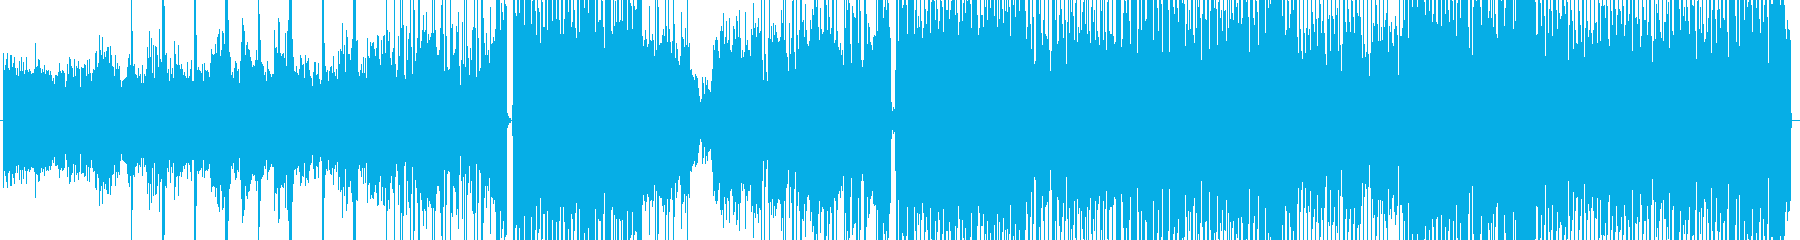 Escapeの再生済みの波形